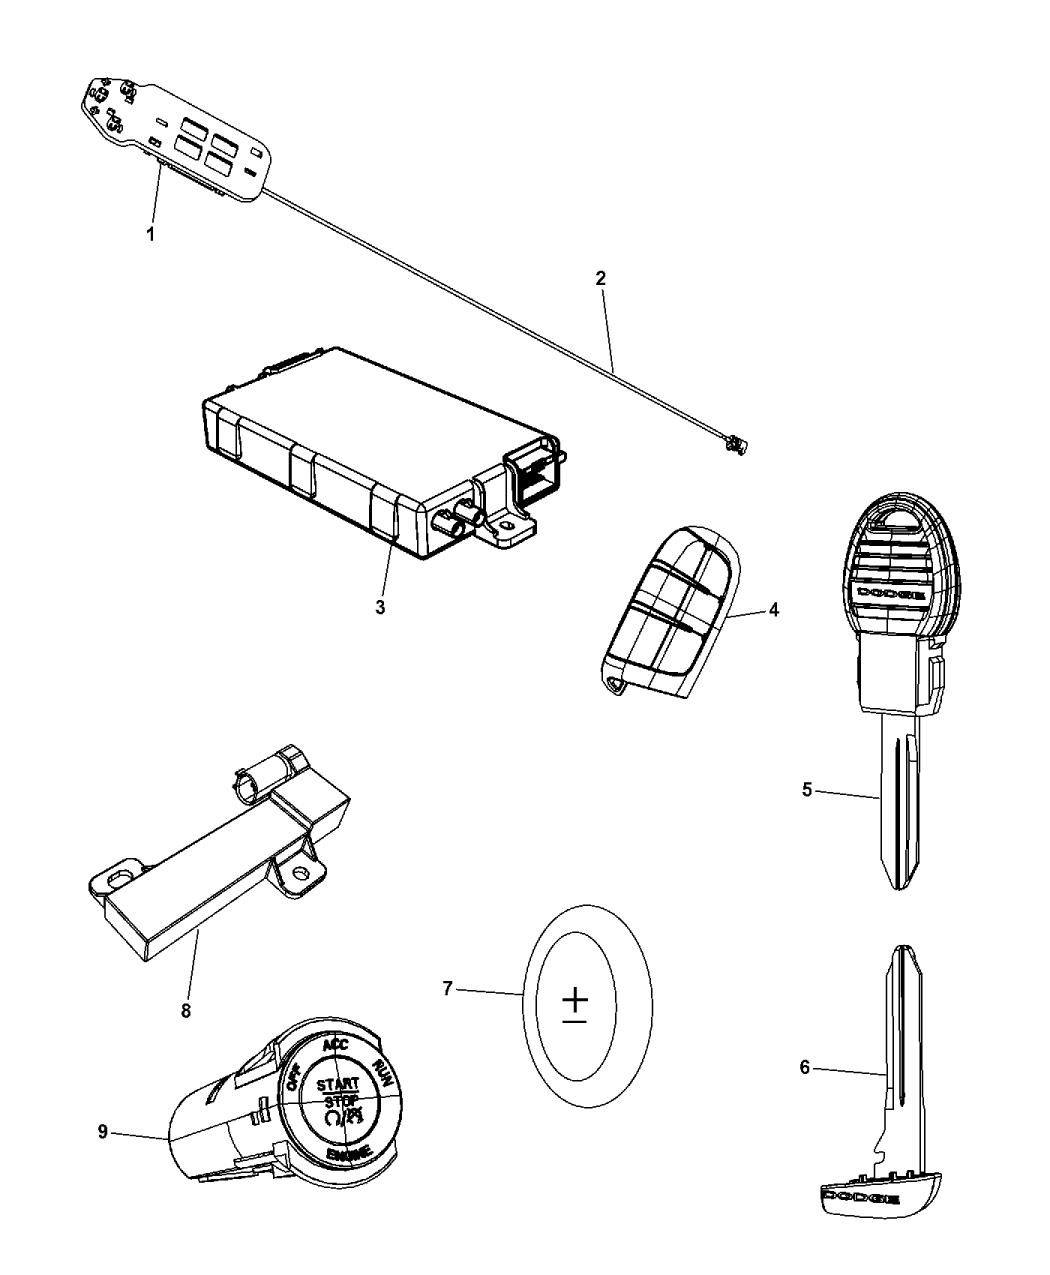 2014 Dodge Journey Receiver Modules, Keys & Key Fobs